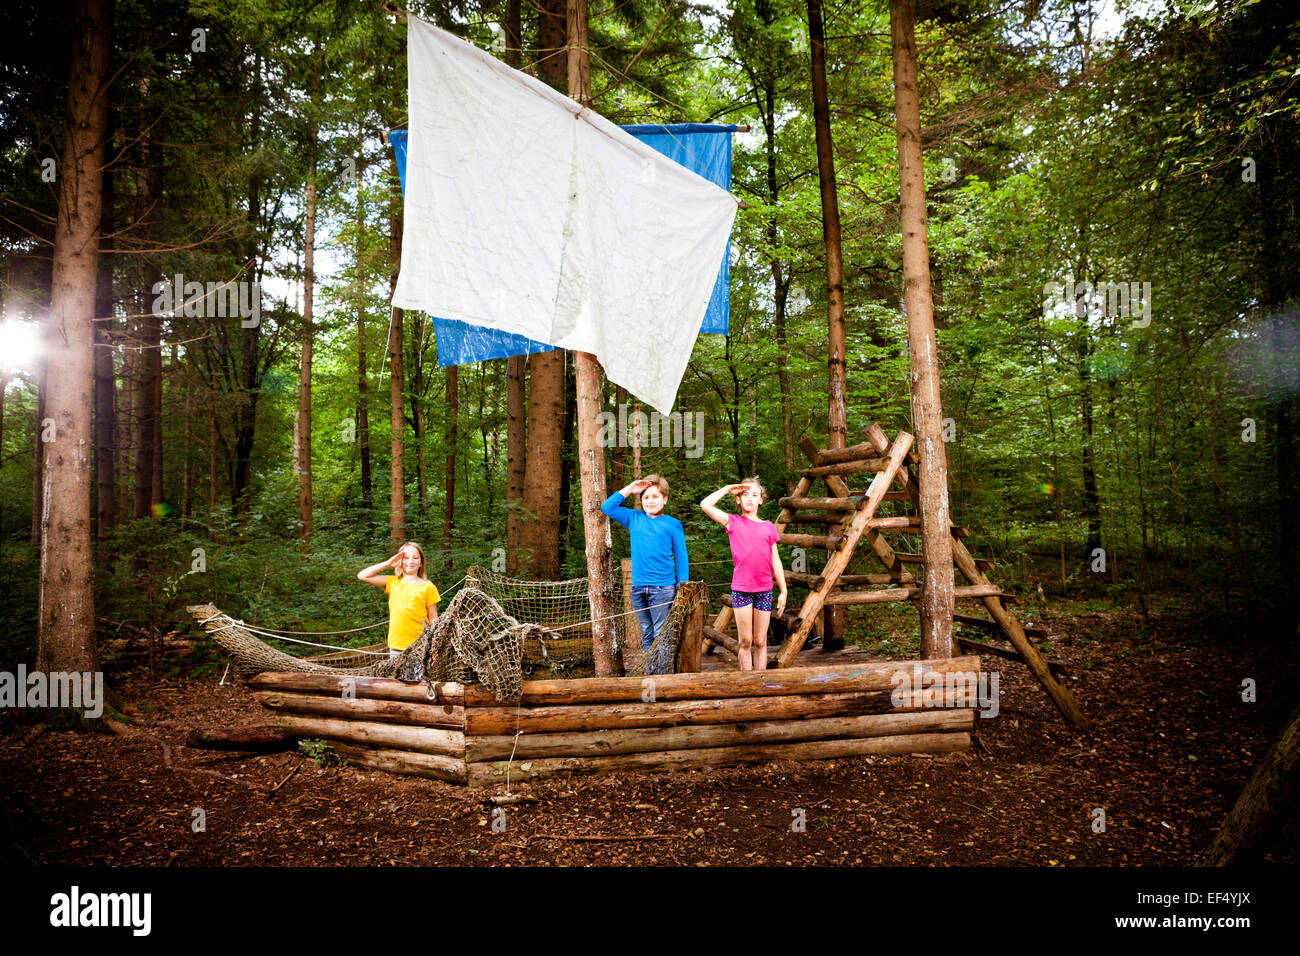 Children playing on wooden sailboat, Munich, Bavaria, Germany - Stock Image